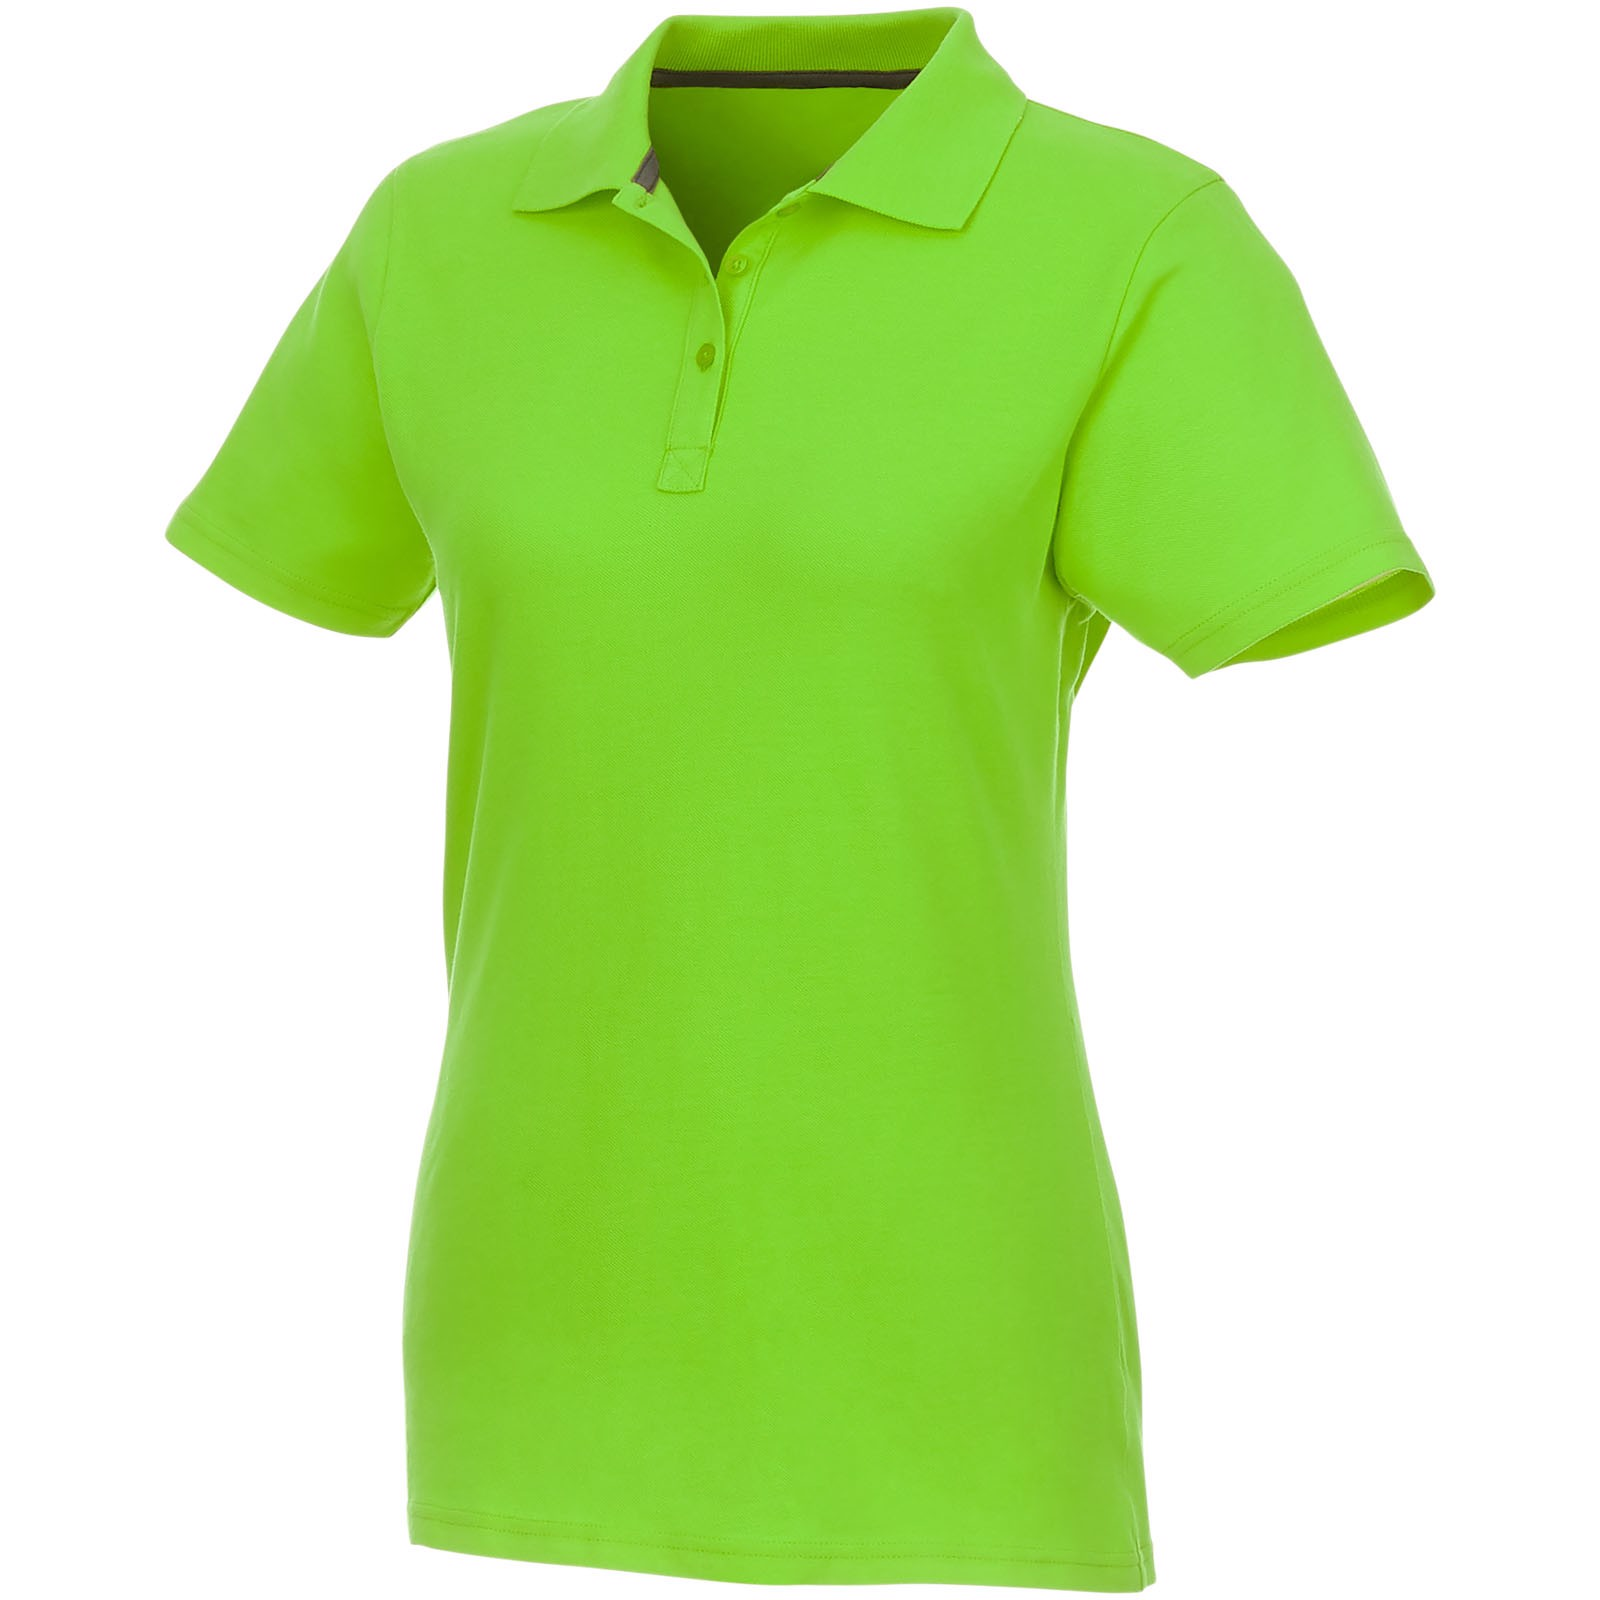 Helios short sleeve women's polo - Apple green / M